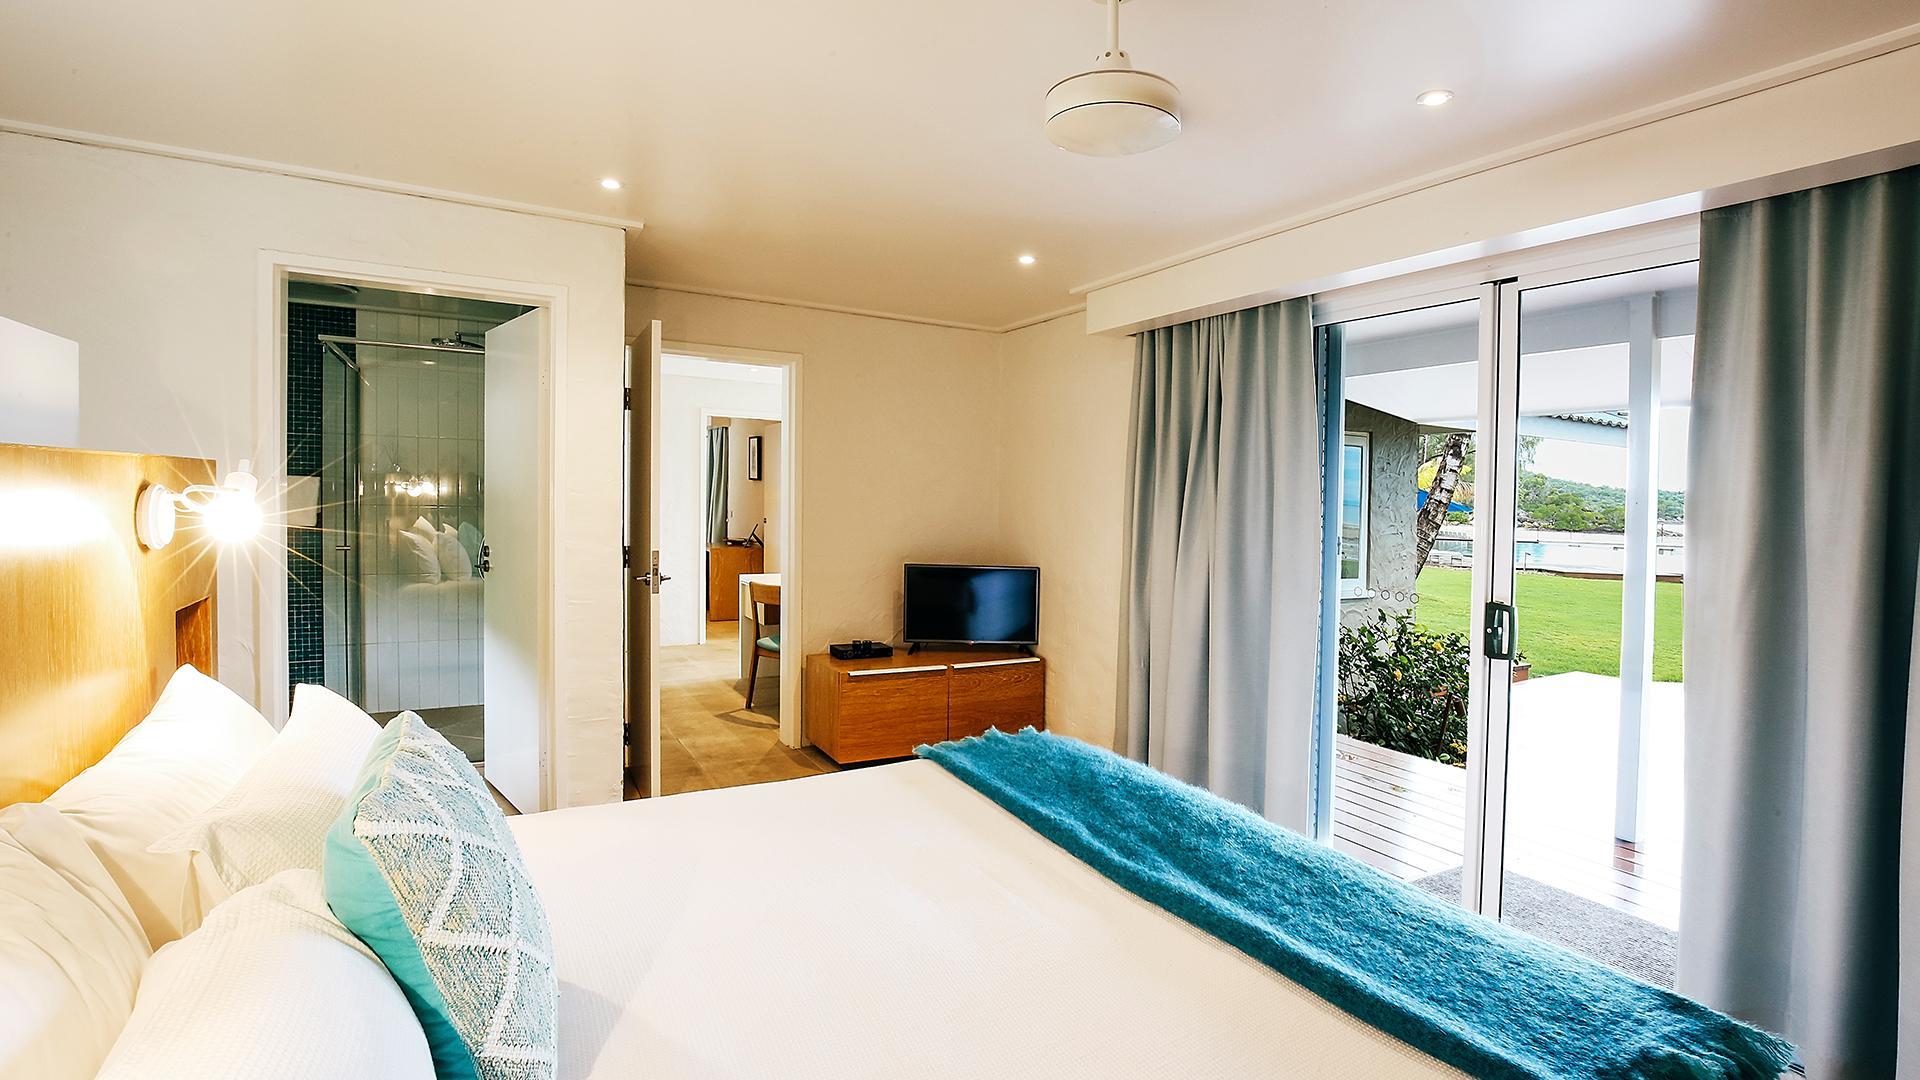 North Beachfront Suite NOV2018 image 1 at Orpheus Island Lodge by null, Queensland, Australia